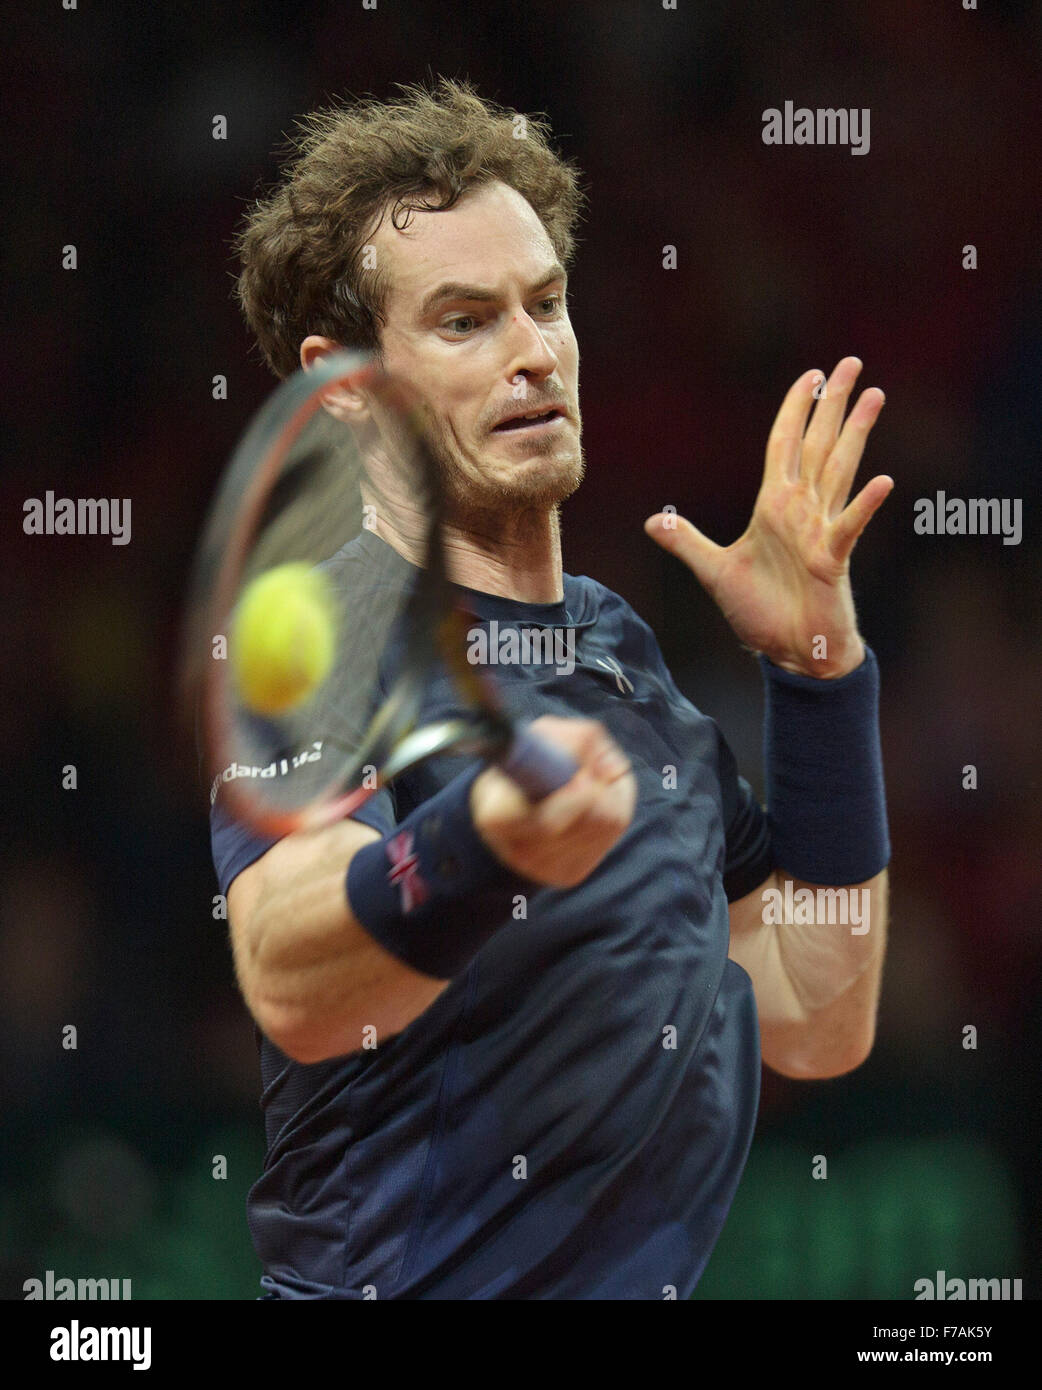 Gent, Belgium, November 27, 2015, Davis Cup Final, Belgium-Great Britain, Second match, Andy Murray (GBR)  Credit: - Stock Image